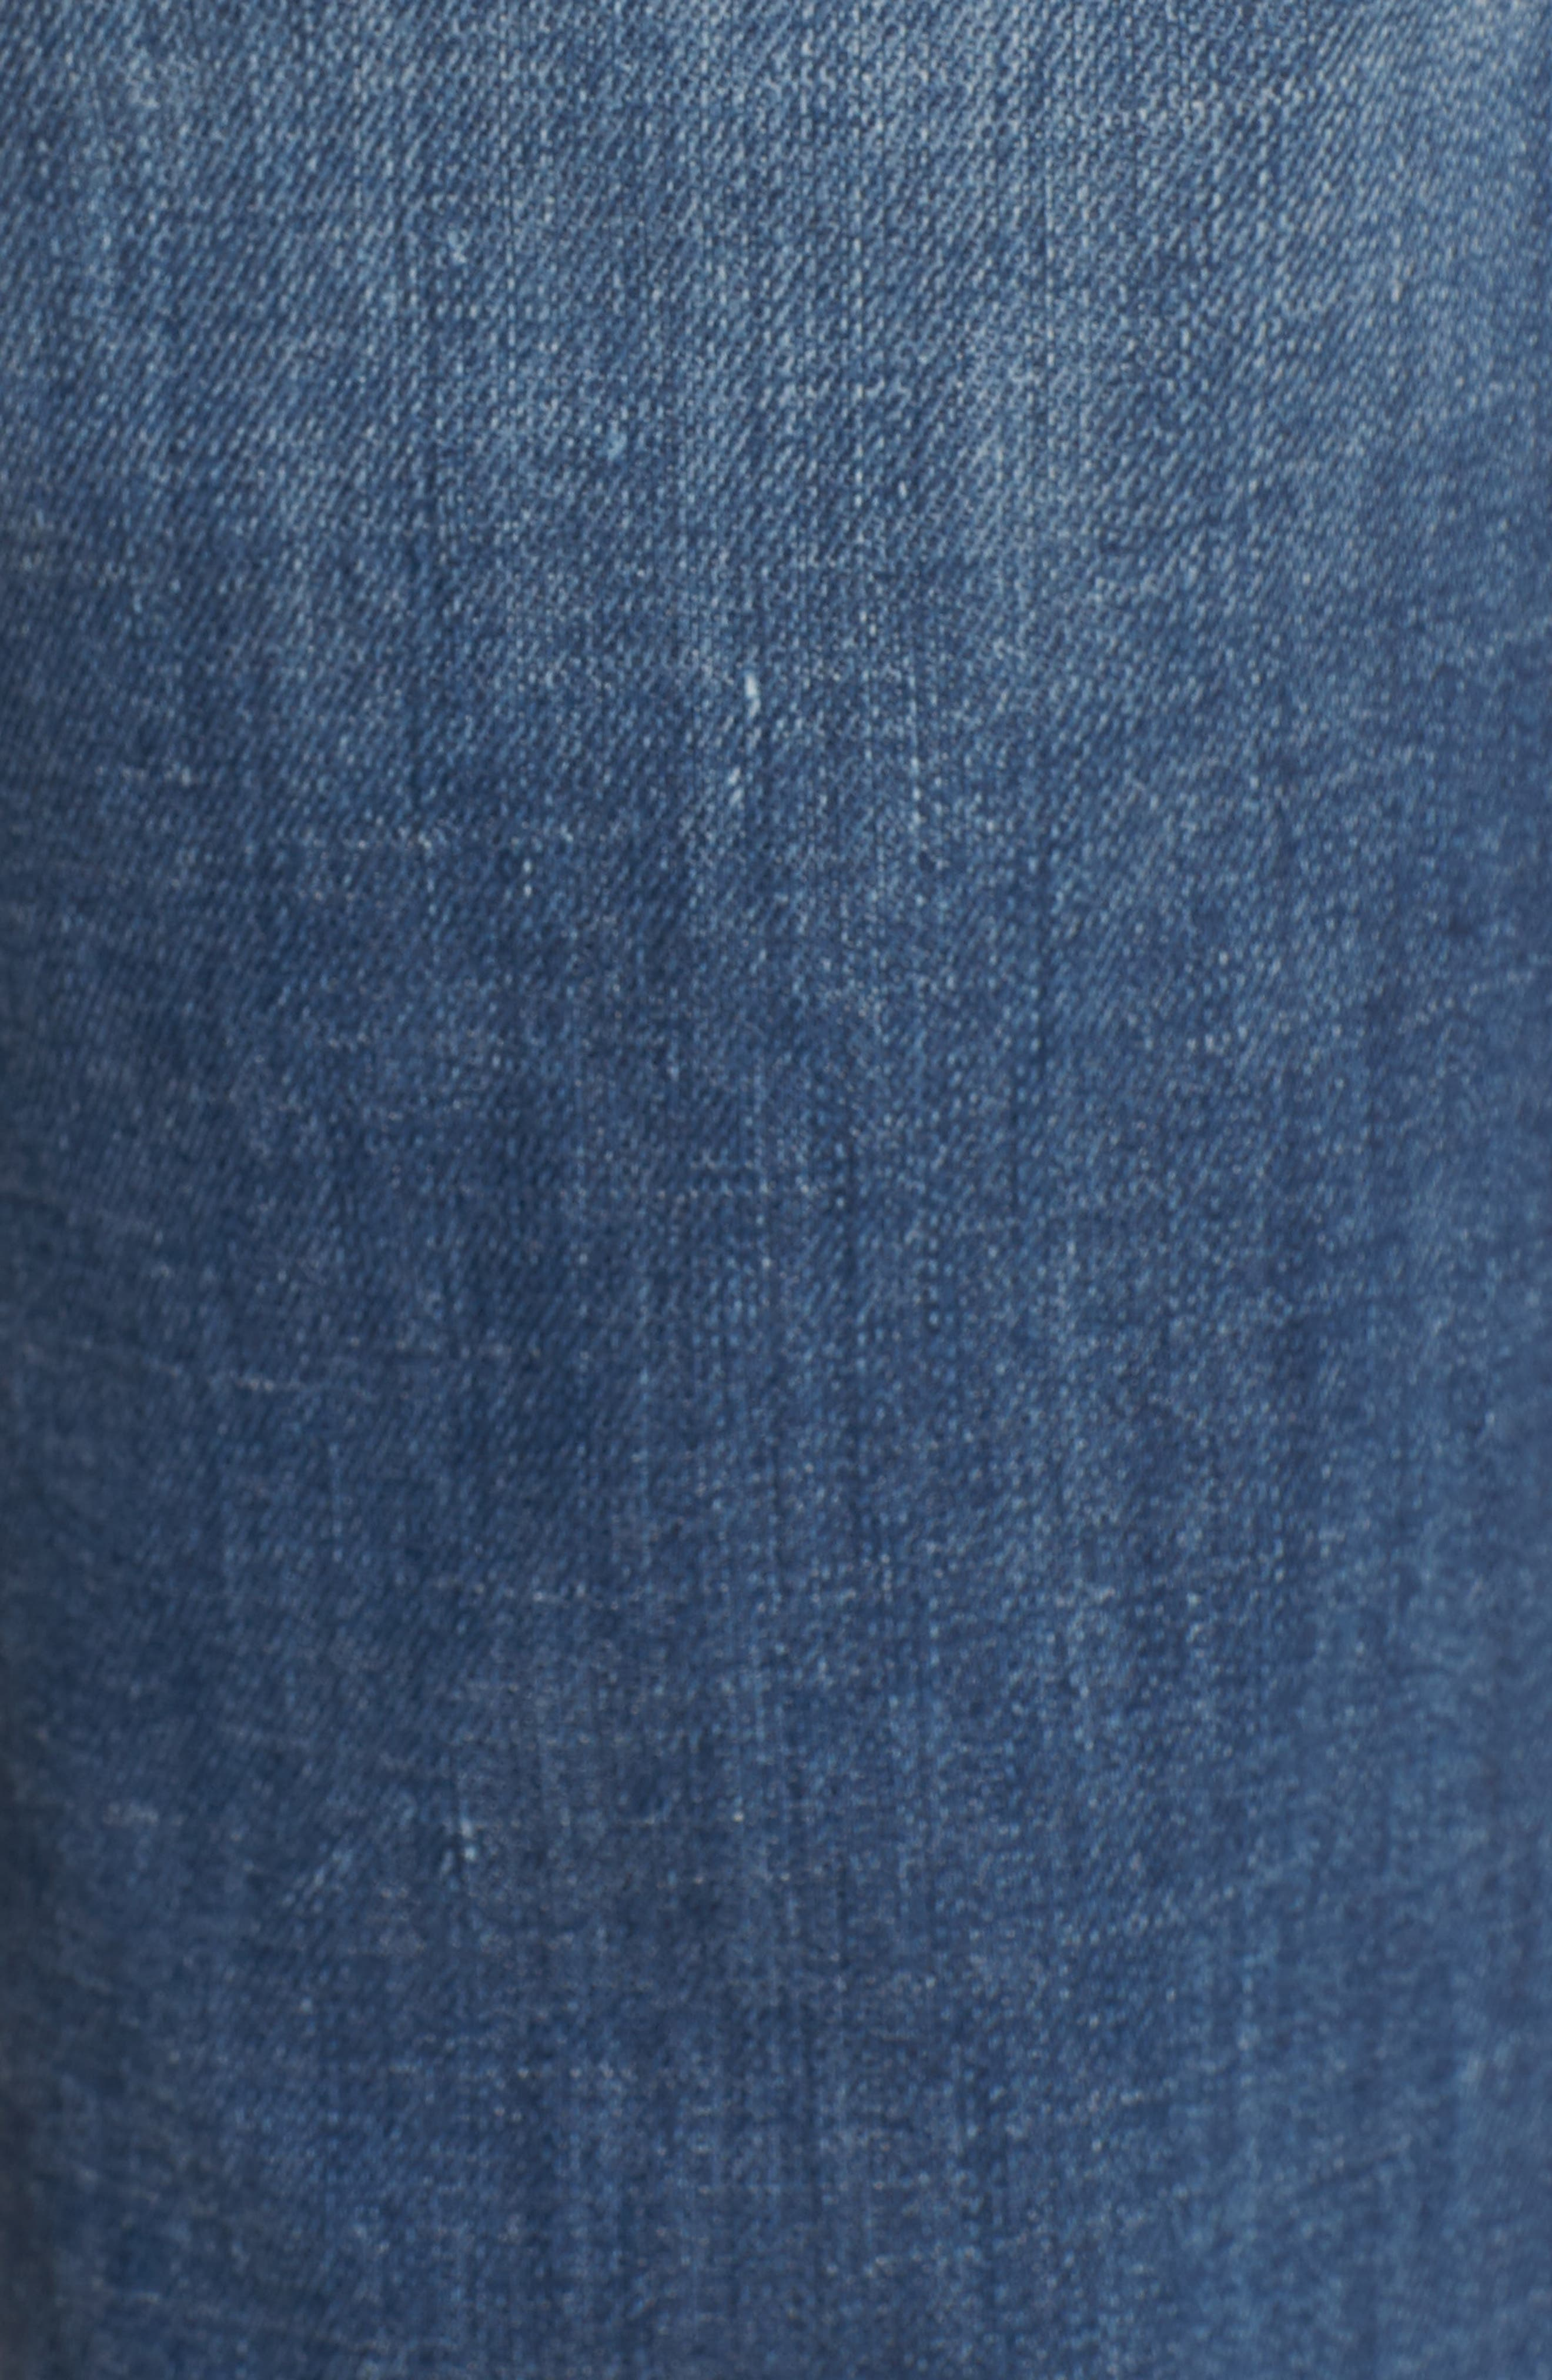 Jennie Runaway Legging Jeans,                             Alternate thumbnail 6, color,                             401